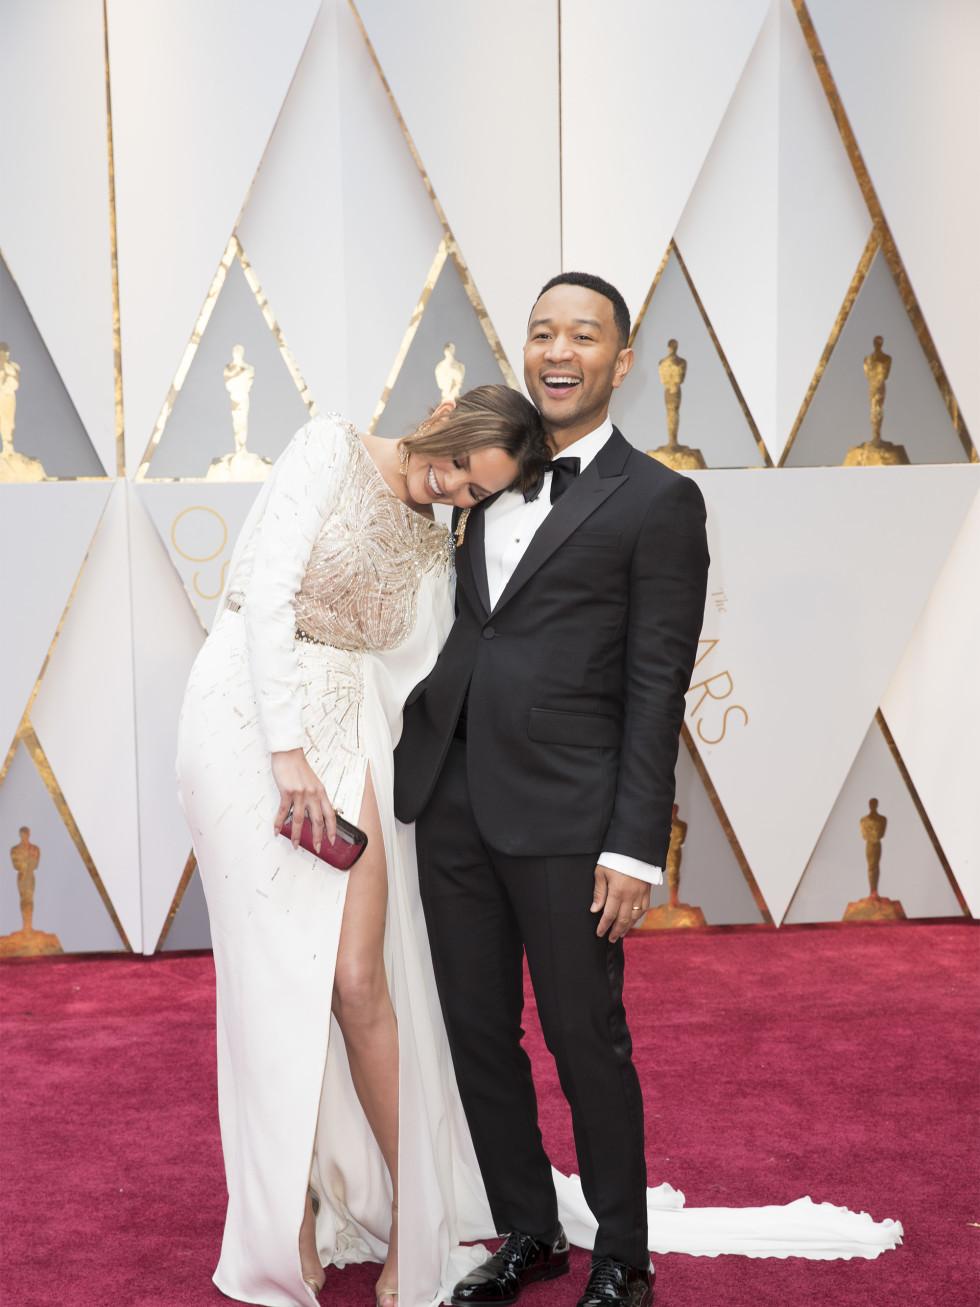 Chrissy Teigen and John Legend at Oscars 2017